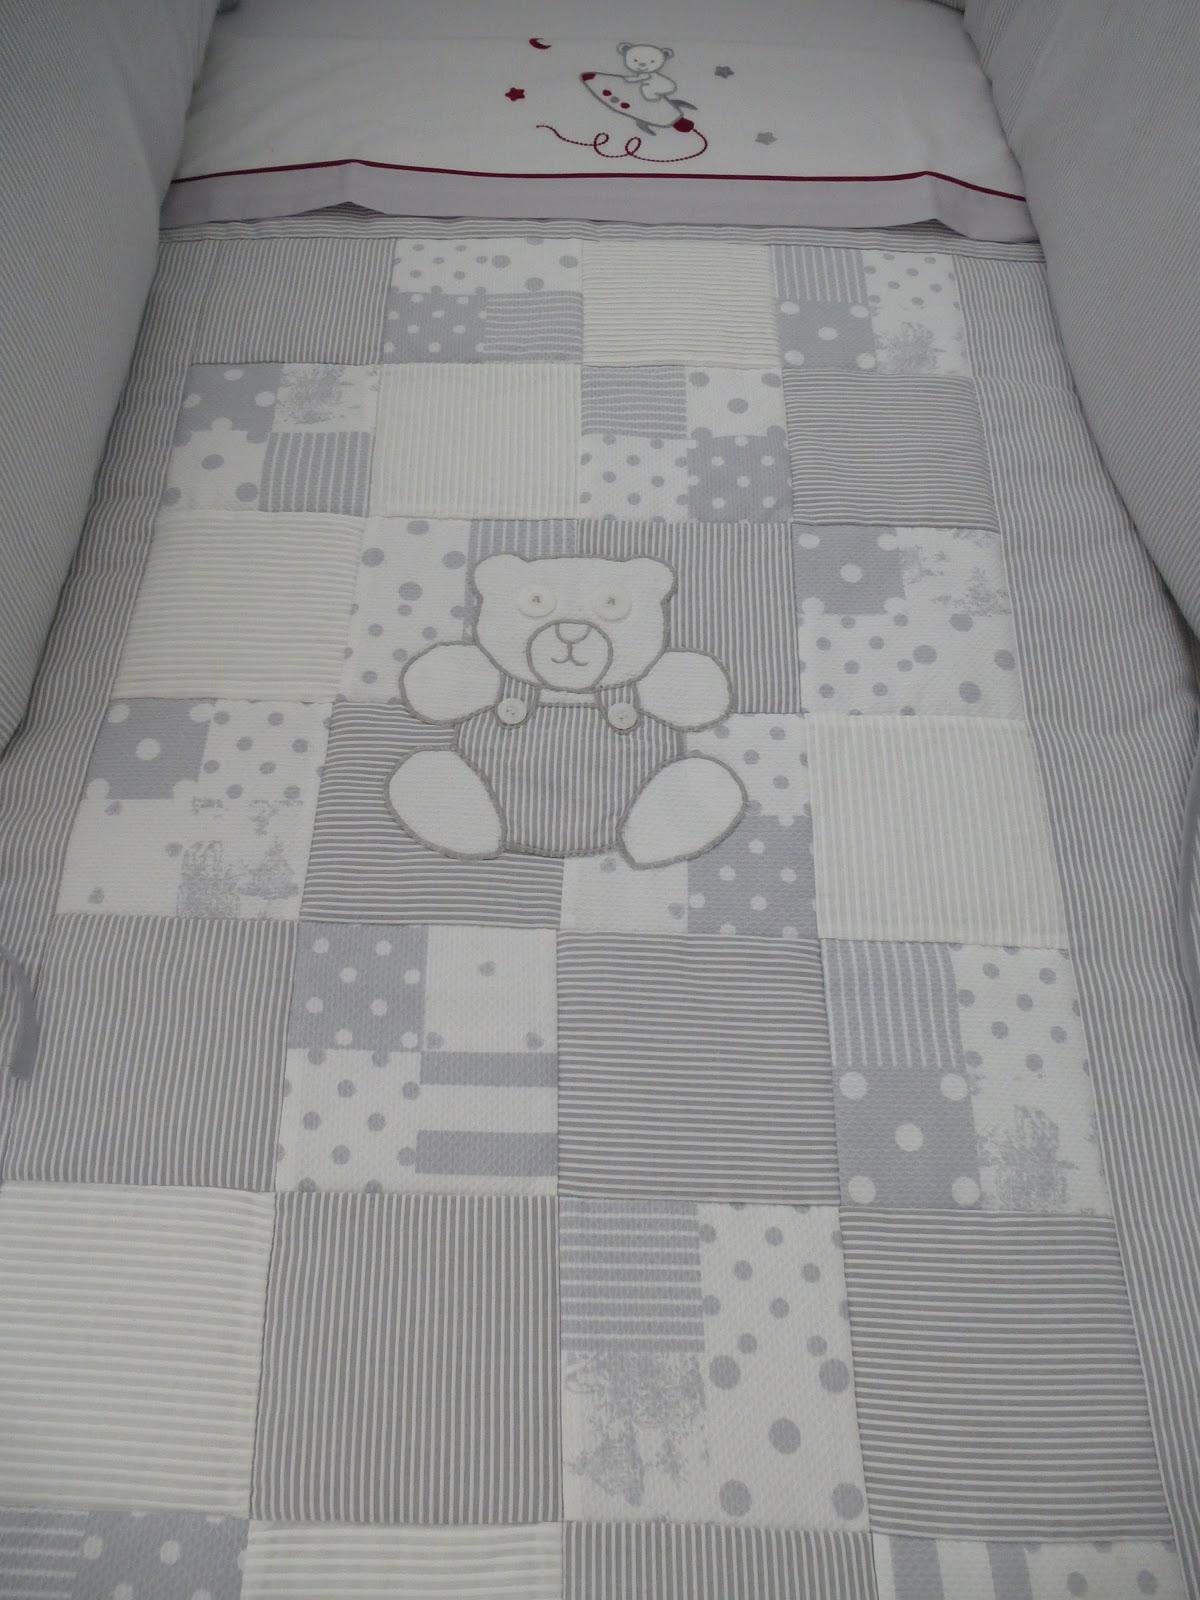 Las labores de mi madre colcha de patchwork - Patrones para colchas de patchwork ...